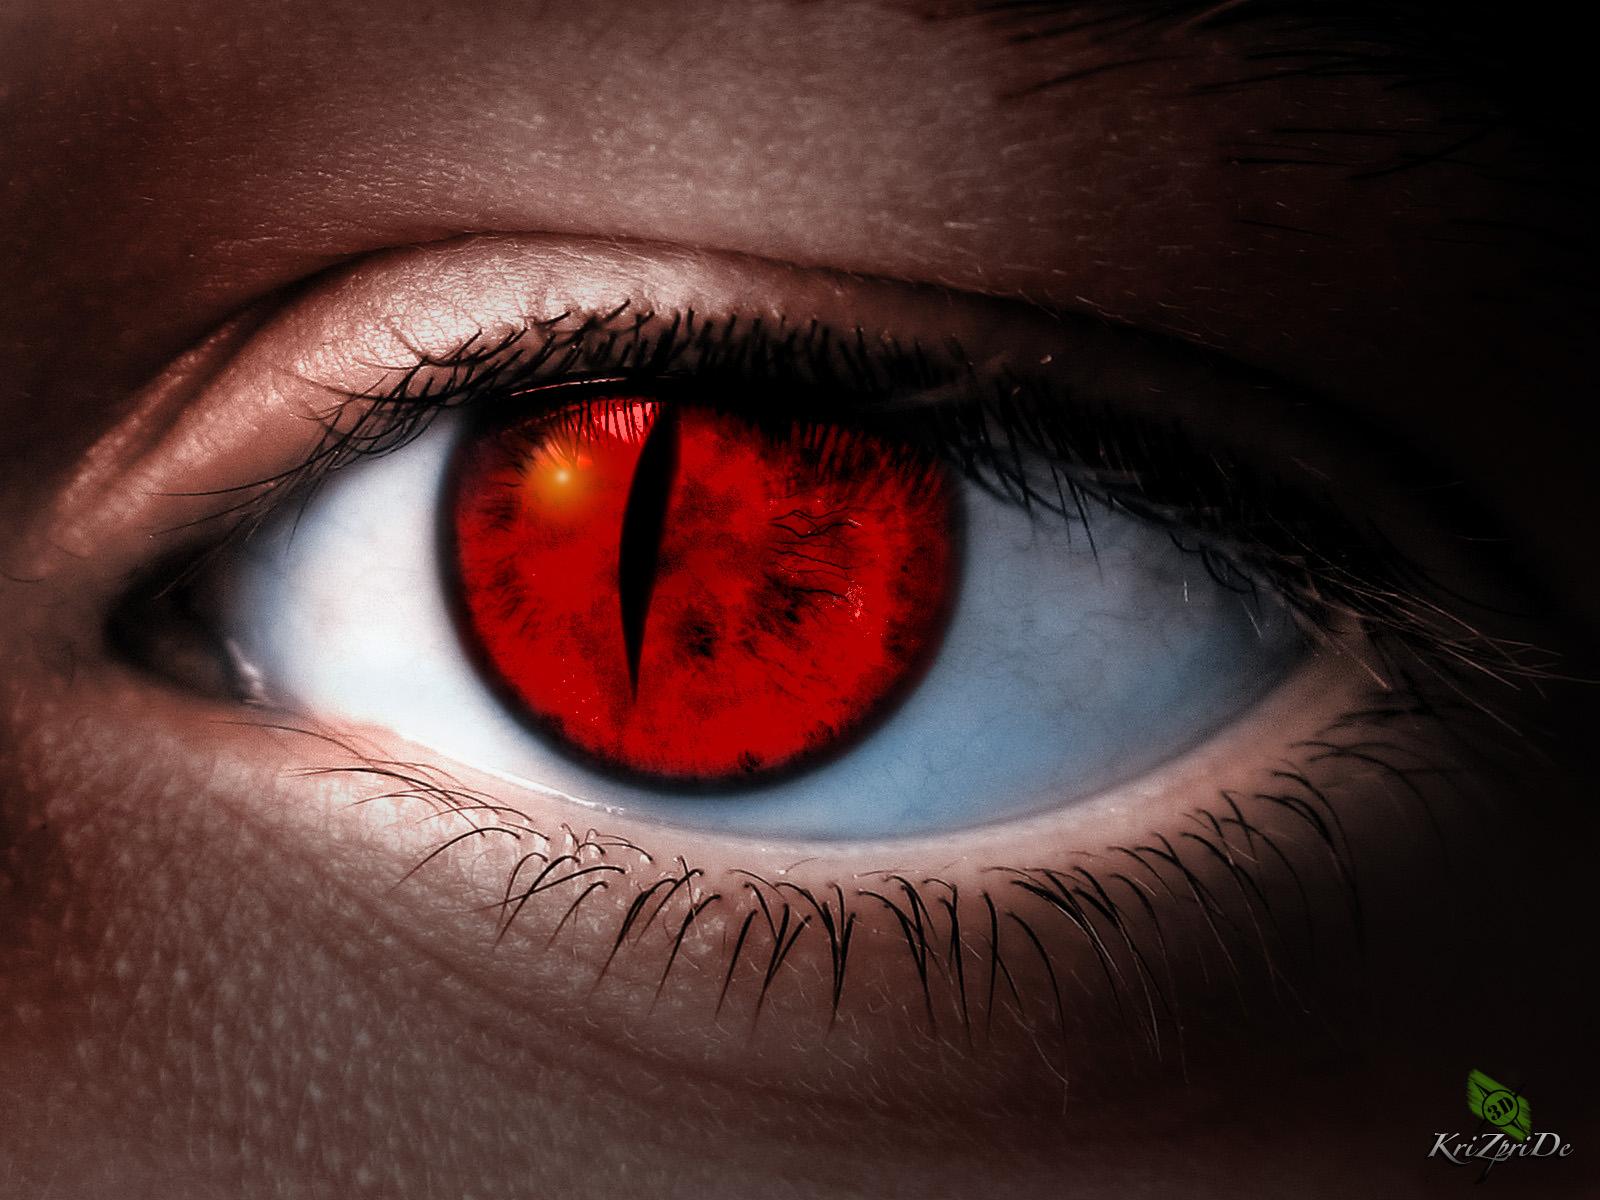 dark inside demon eye quotevcom - HD1600×1200